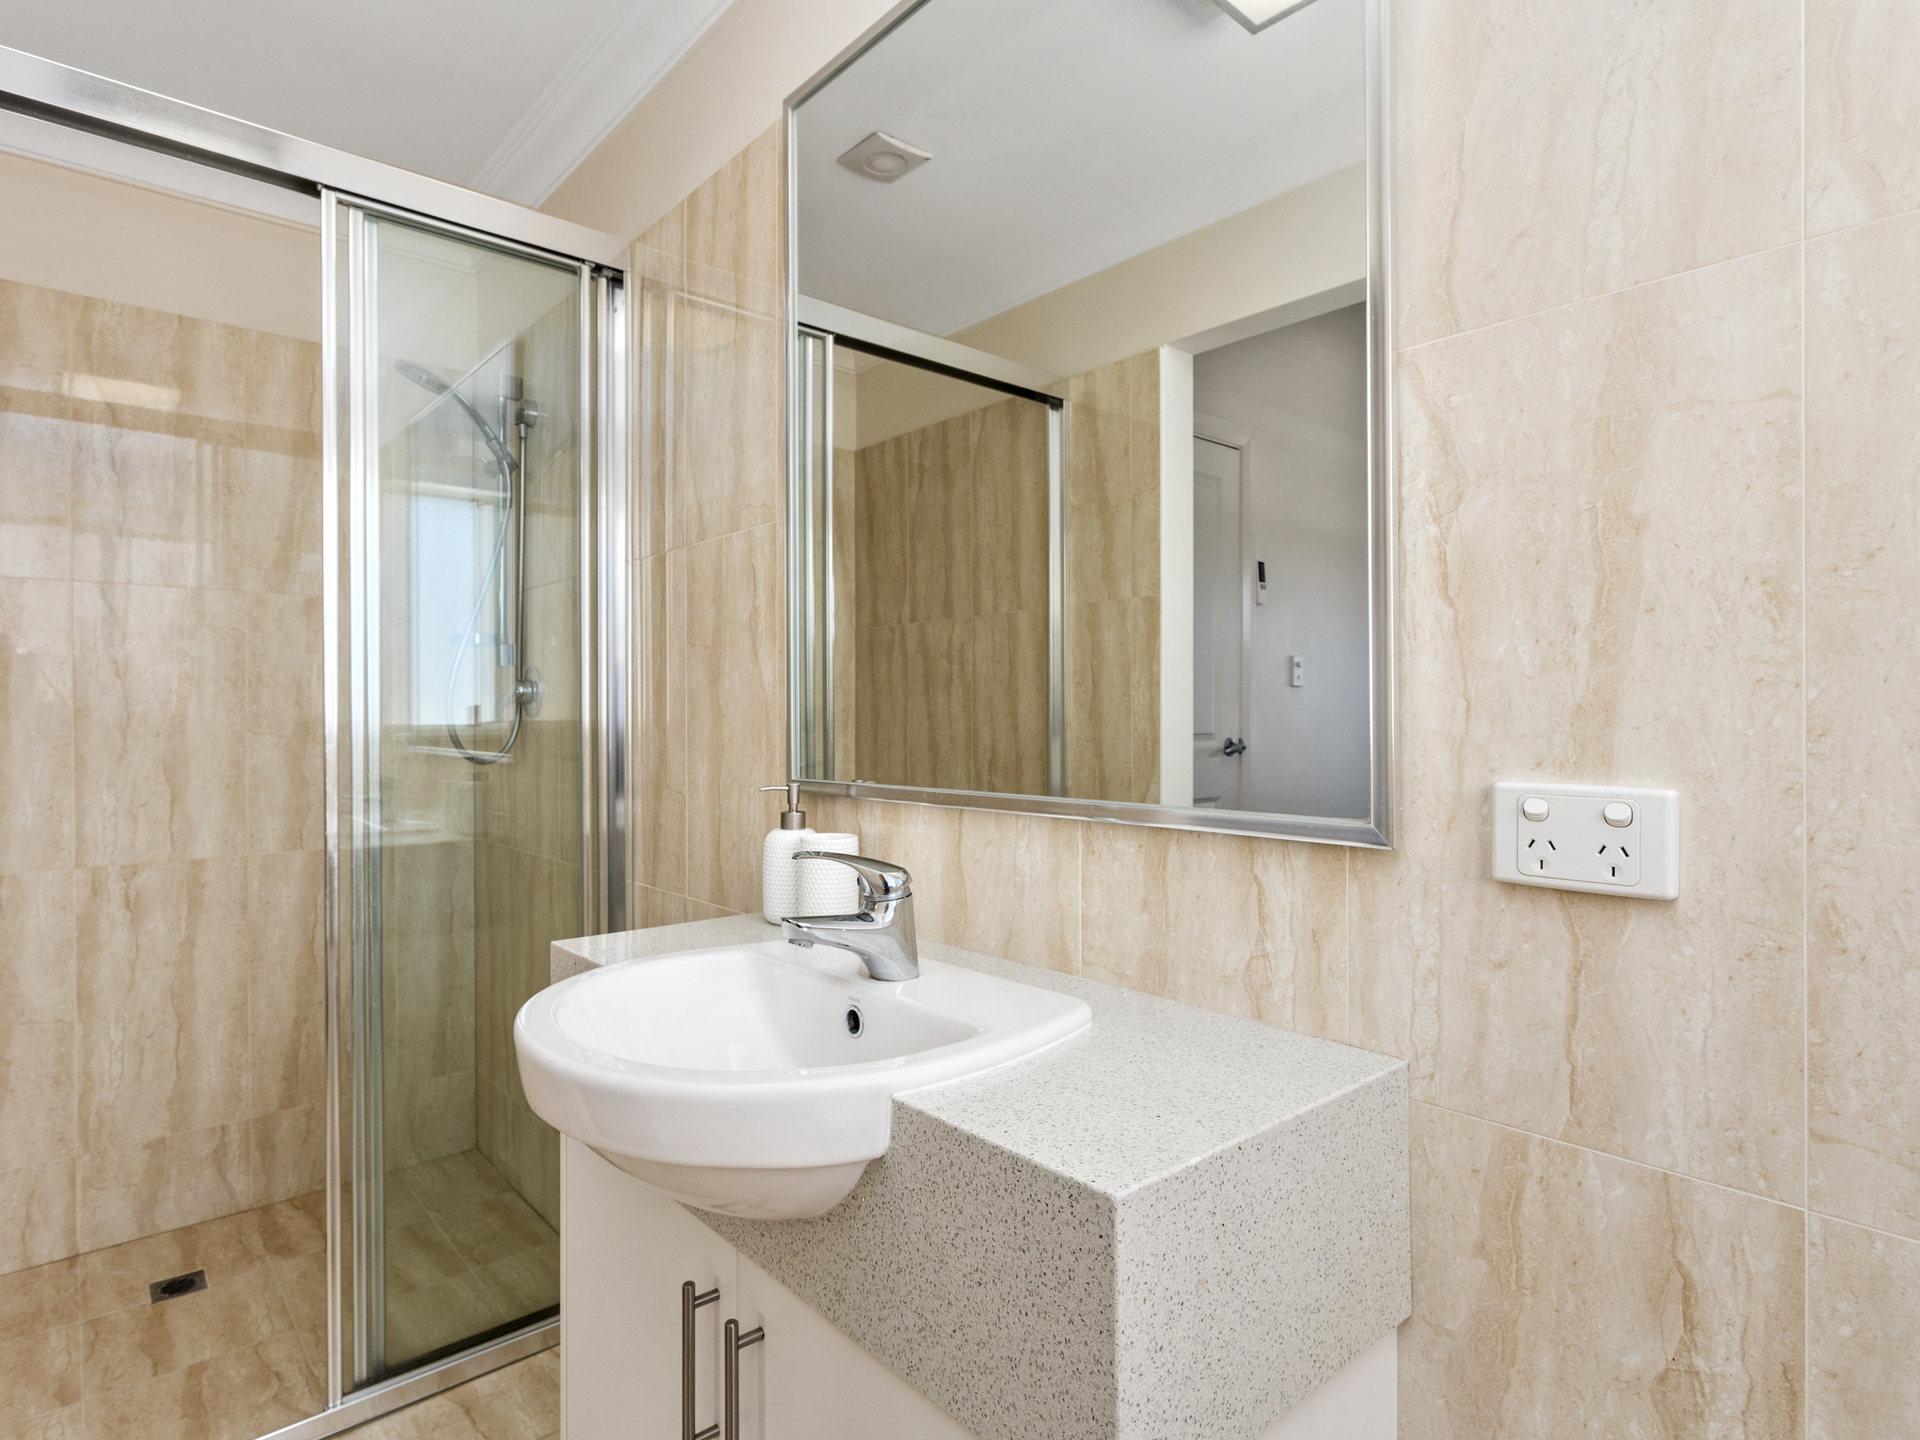 Room 6 Forrest St Bathroom